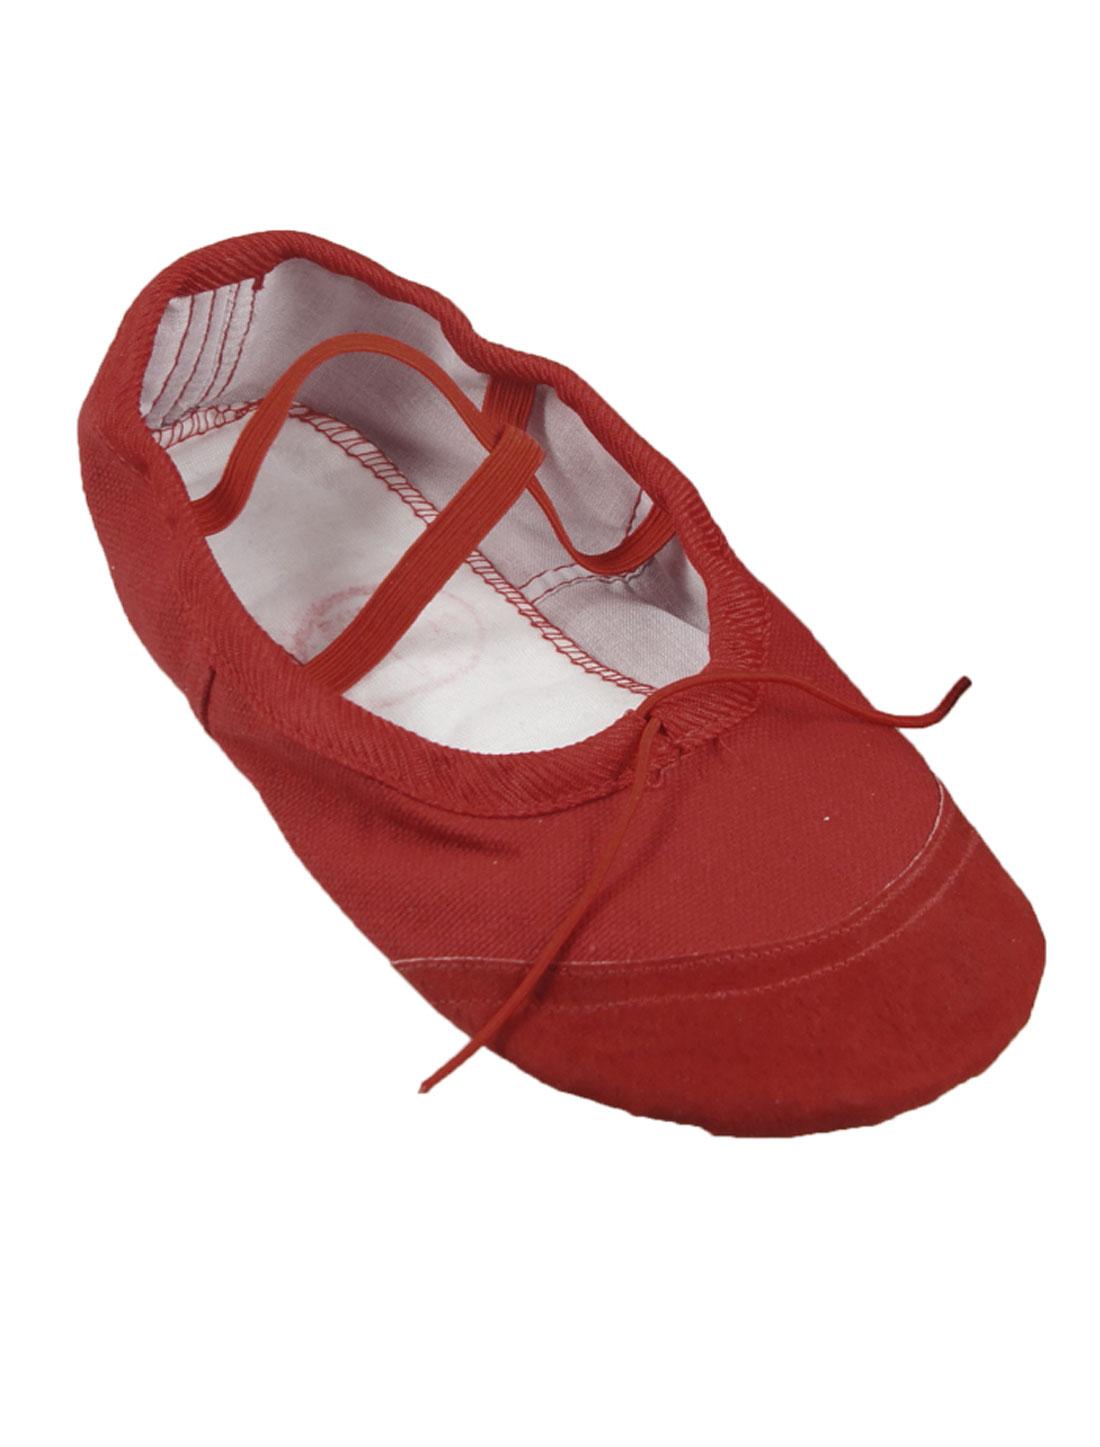 Women Split Sole Red Drawstring Top Ballet Dancing Flats Shoes EU 36